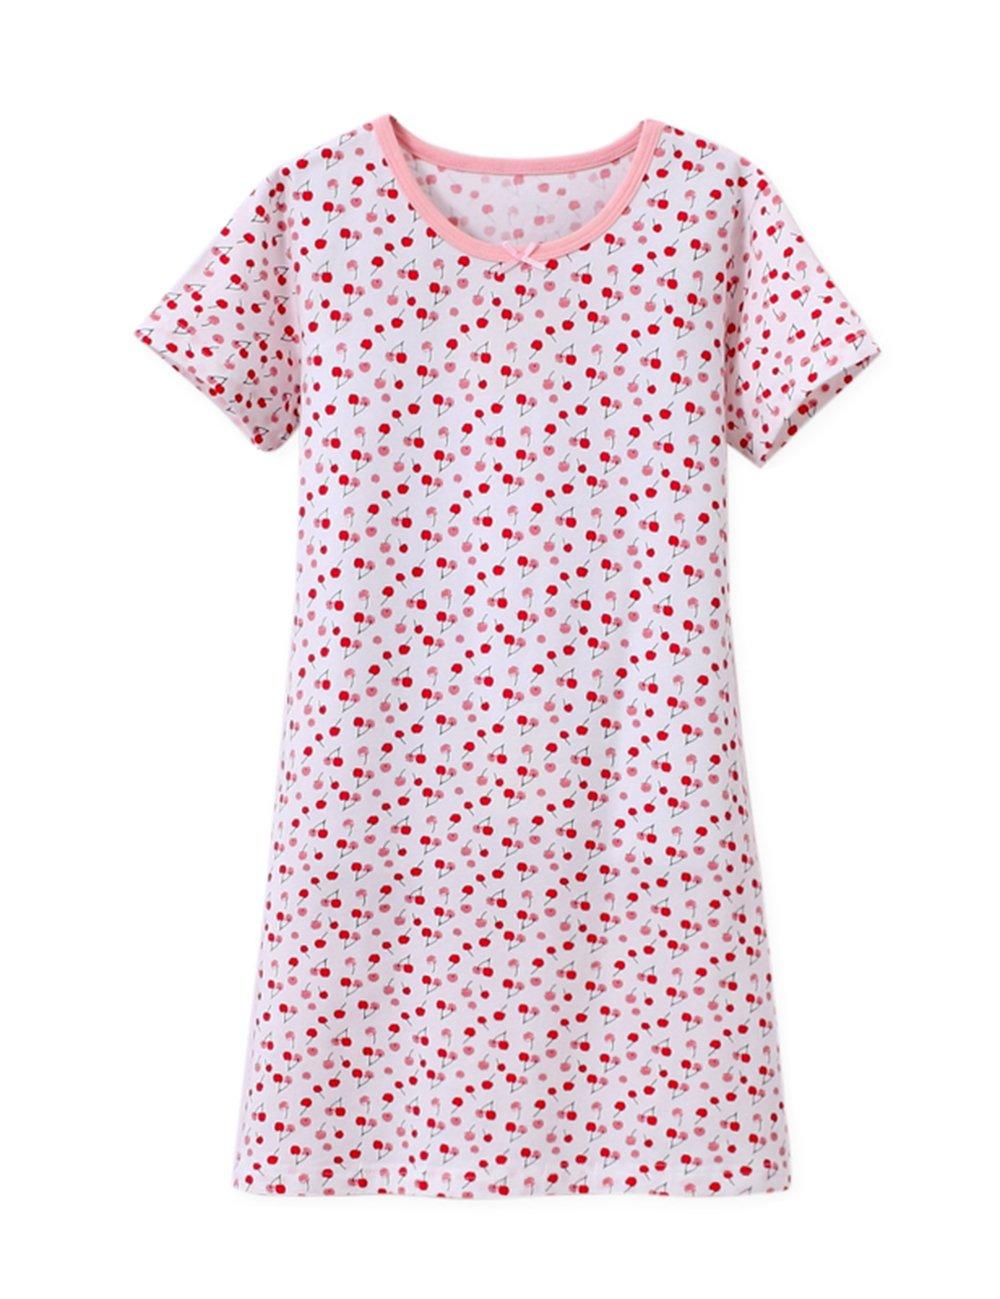 Wsorhui Girls' Princess Nightgowns Cherry Print Cute Sleep Shirts Cotton Sleepwear for 3-11 Years 9-10 Year,150 Cherry White